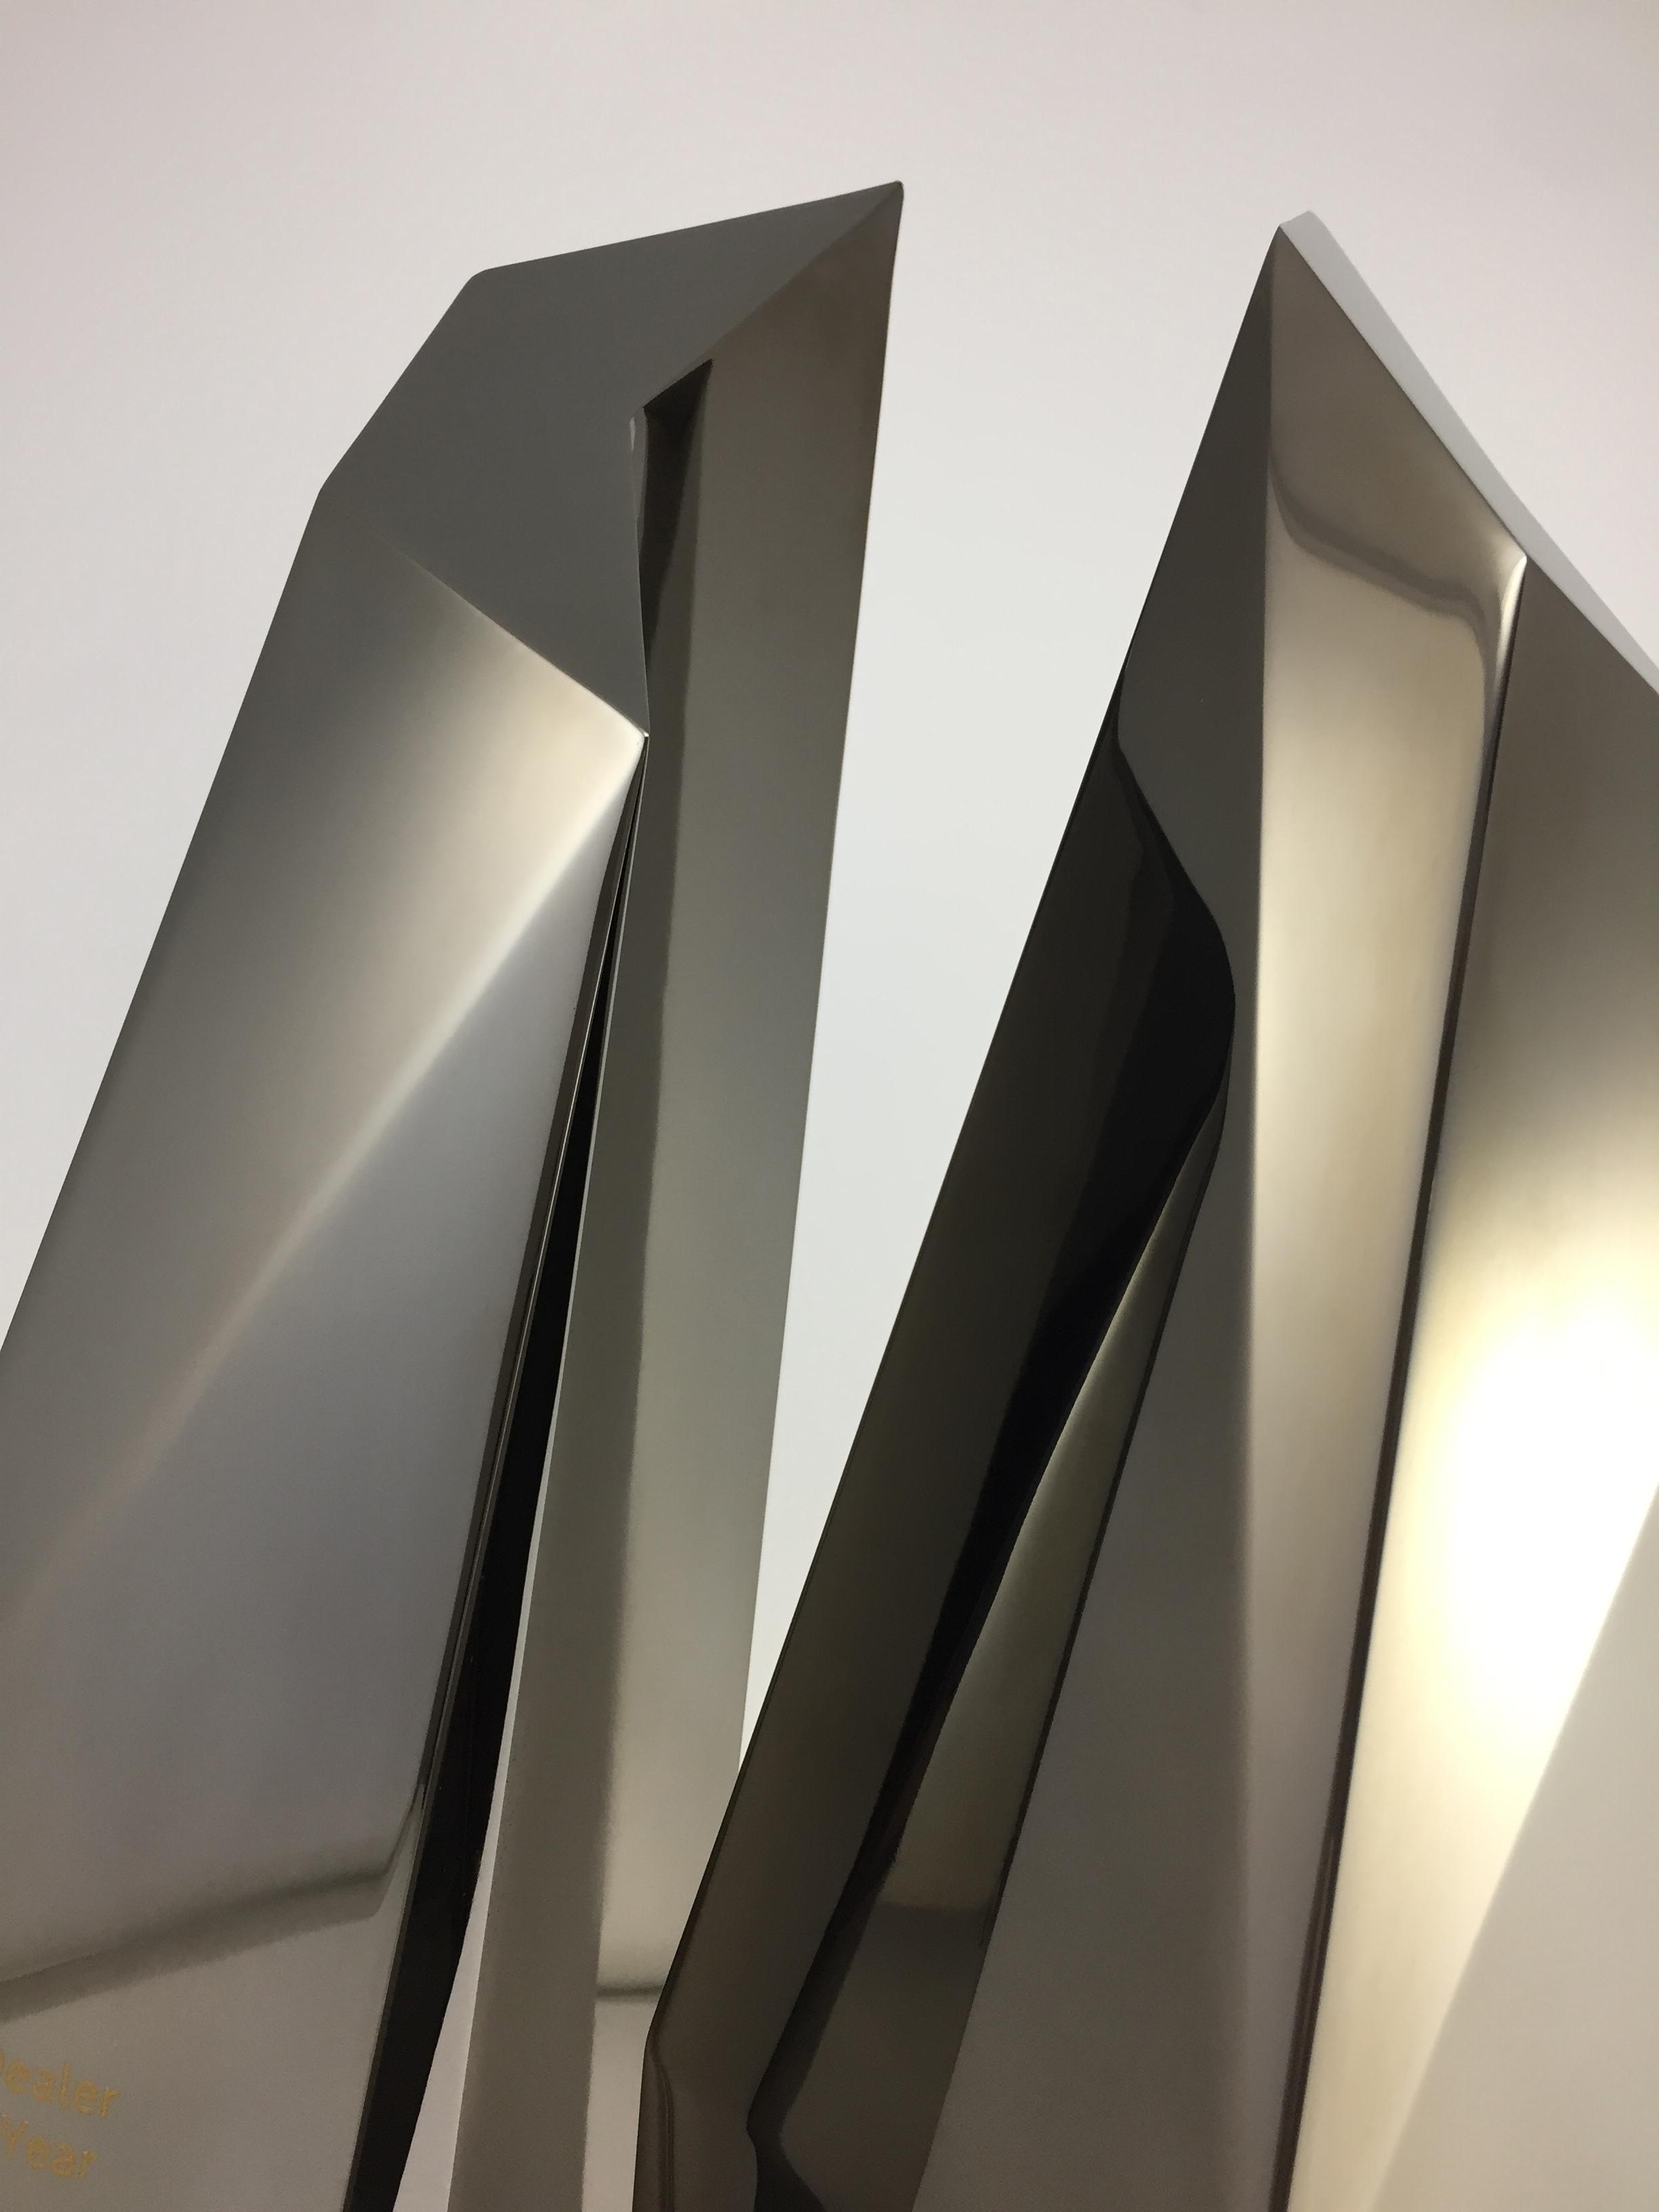 audi-metal-art-sculpture-award-trophy-01.jpg